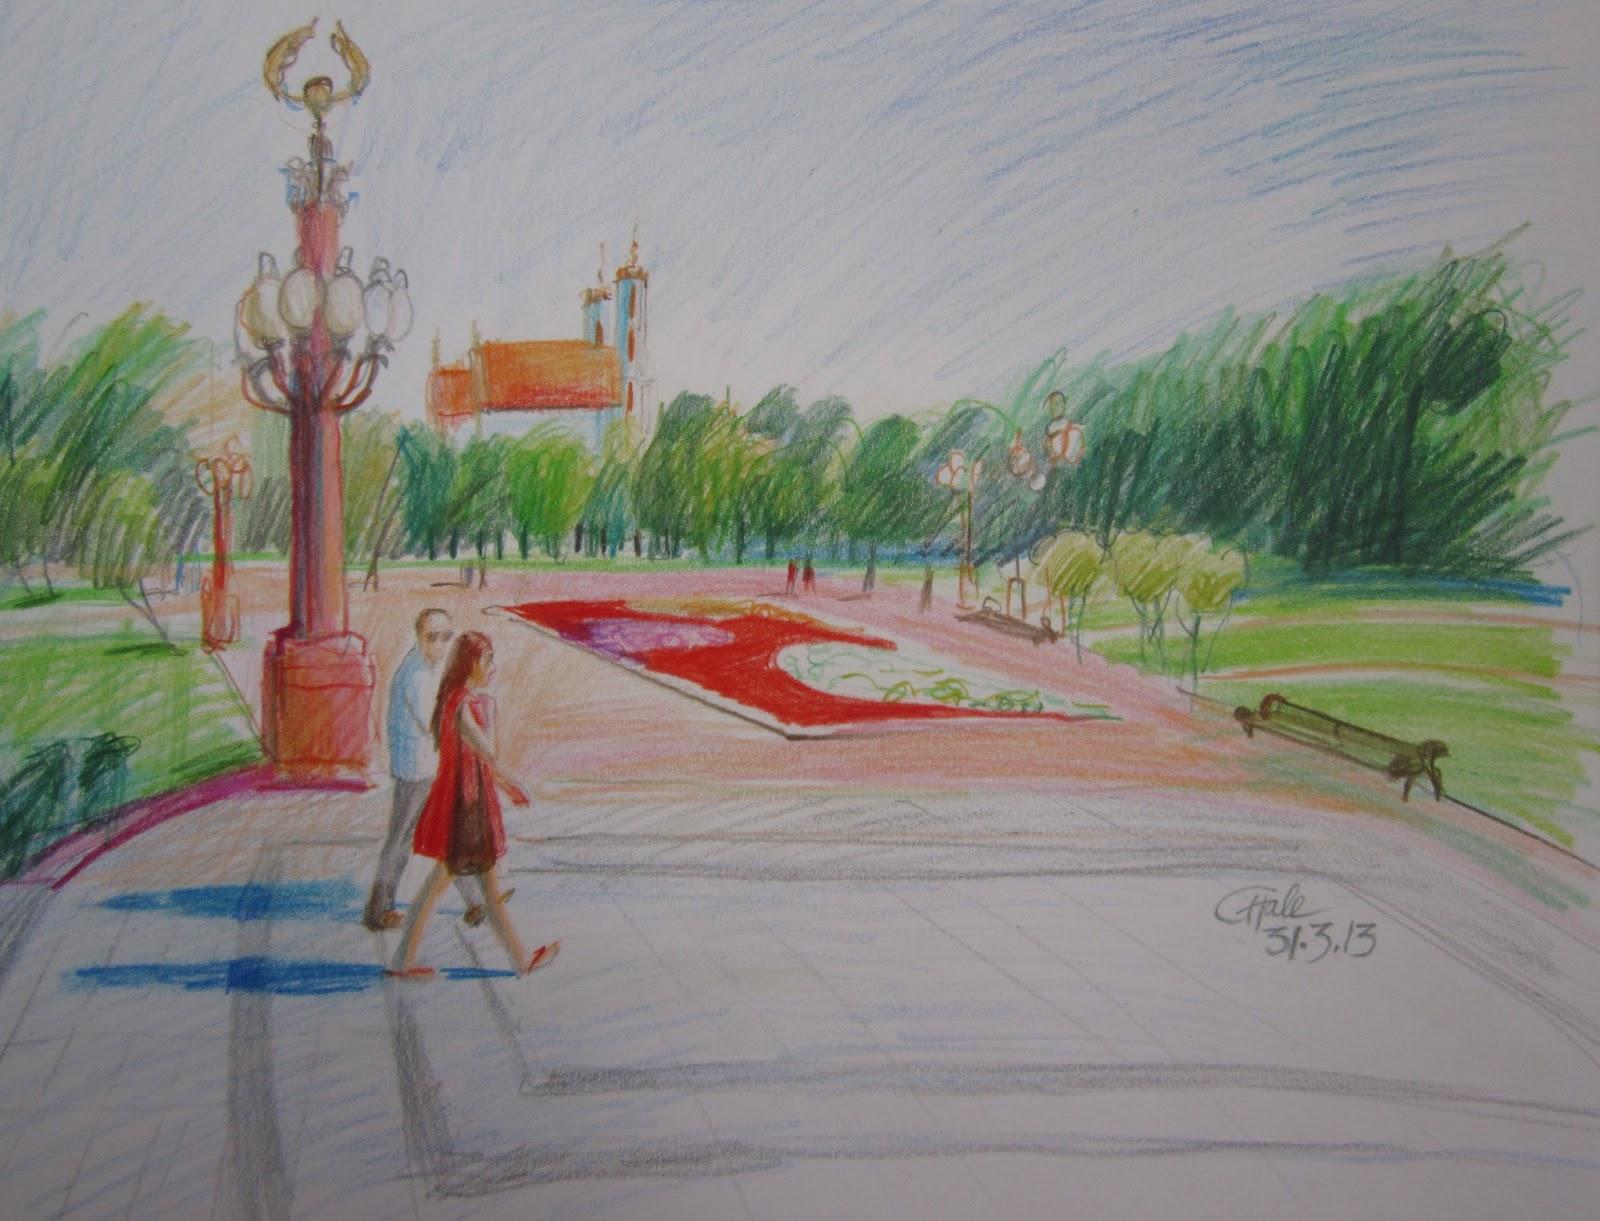 http://1.bp.blogspot.com/-mibsZIa3hOM/UVhMcxmjmAI/AAAAAAAAAlg/YHT-ac4LlAE/s1600/C+Hale+Vilnius.JPG